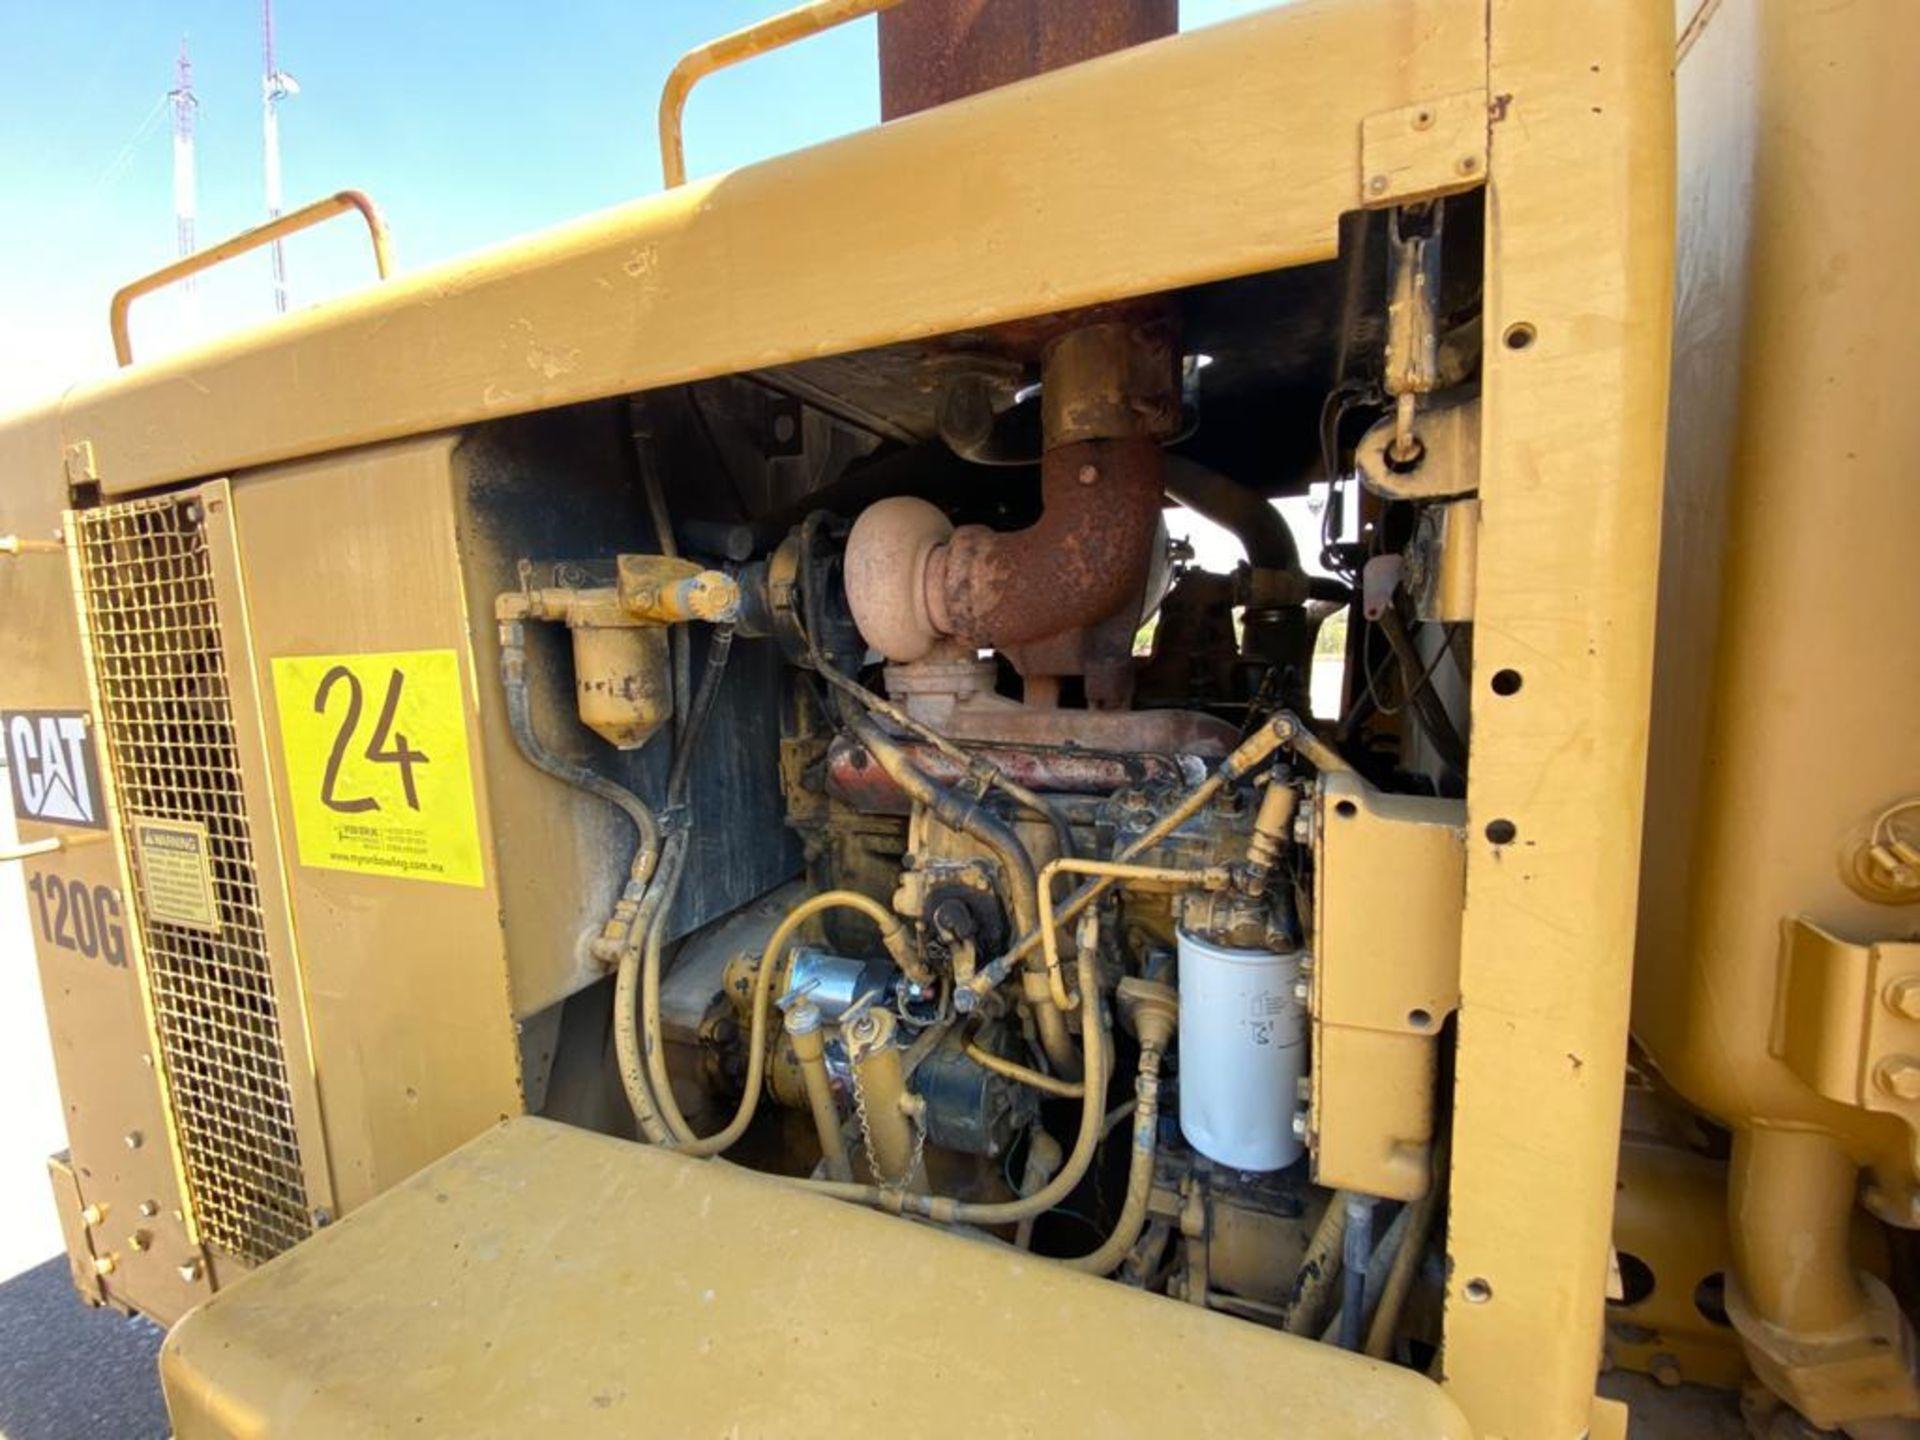 Caterpillar 120G Motor Grader, Serial number 87V09646, Motor number PQ883-2/07Z28983 - Image 53 of 61